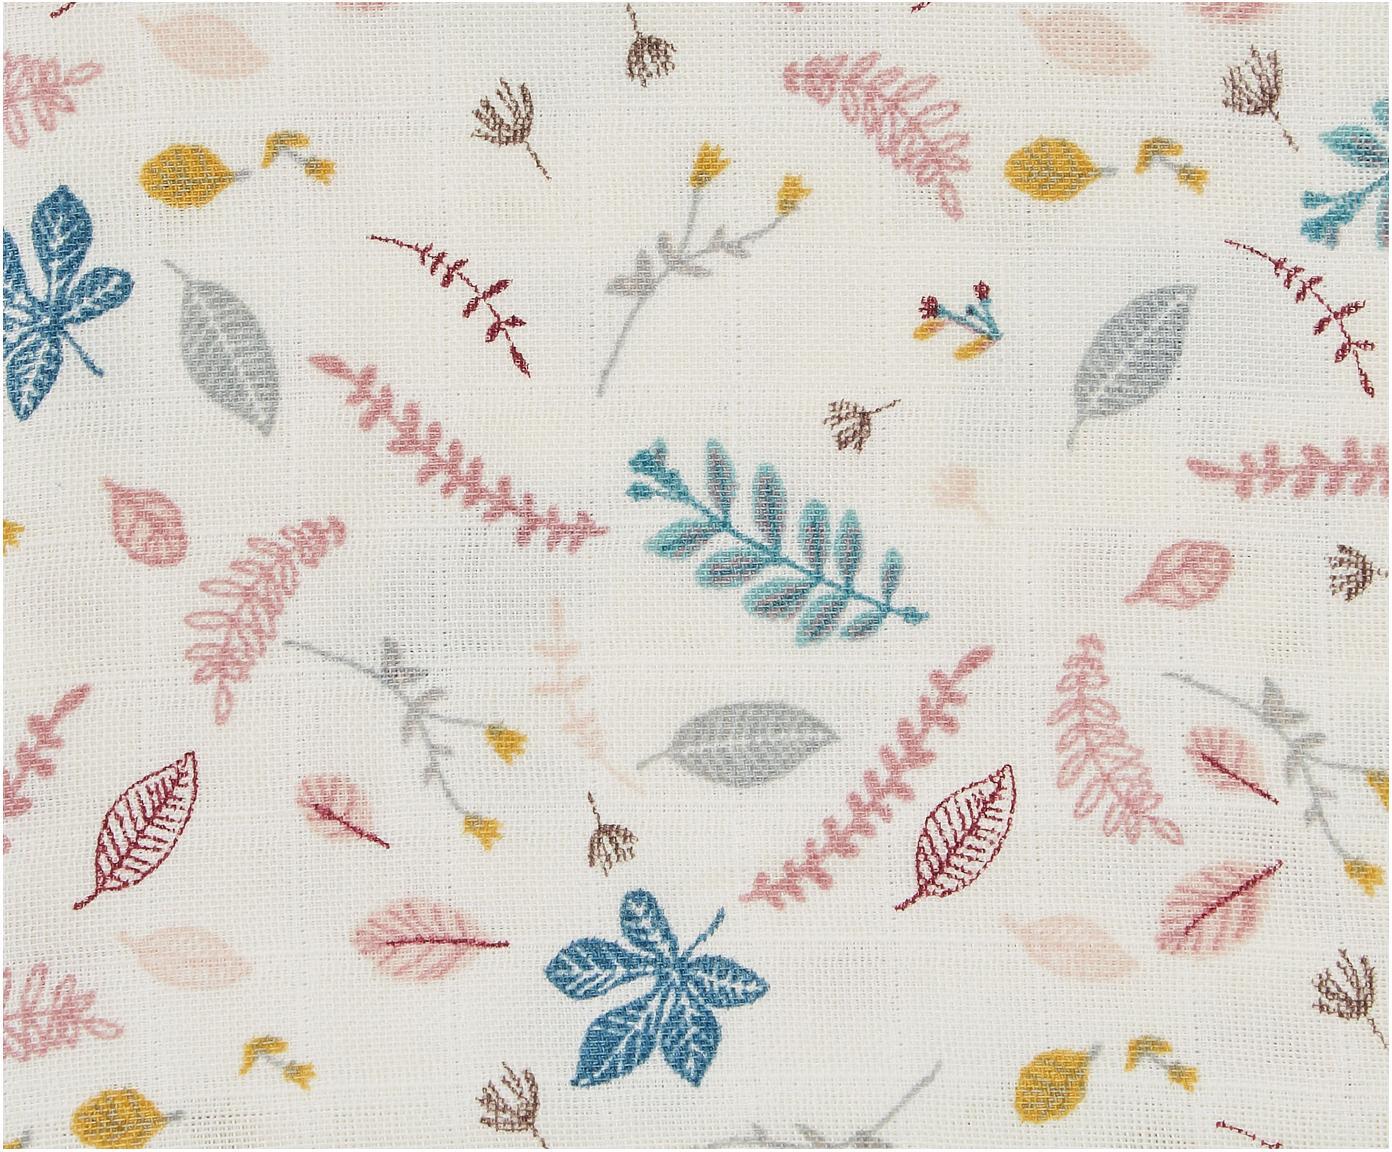 Bavlněná plenka z organické bavlny Pressed Leaves, 2 ks, Krémová, růžová, modrá, šedá